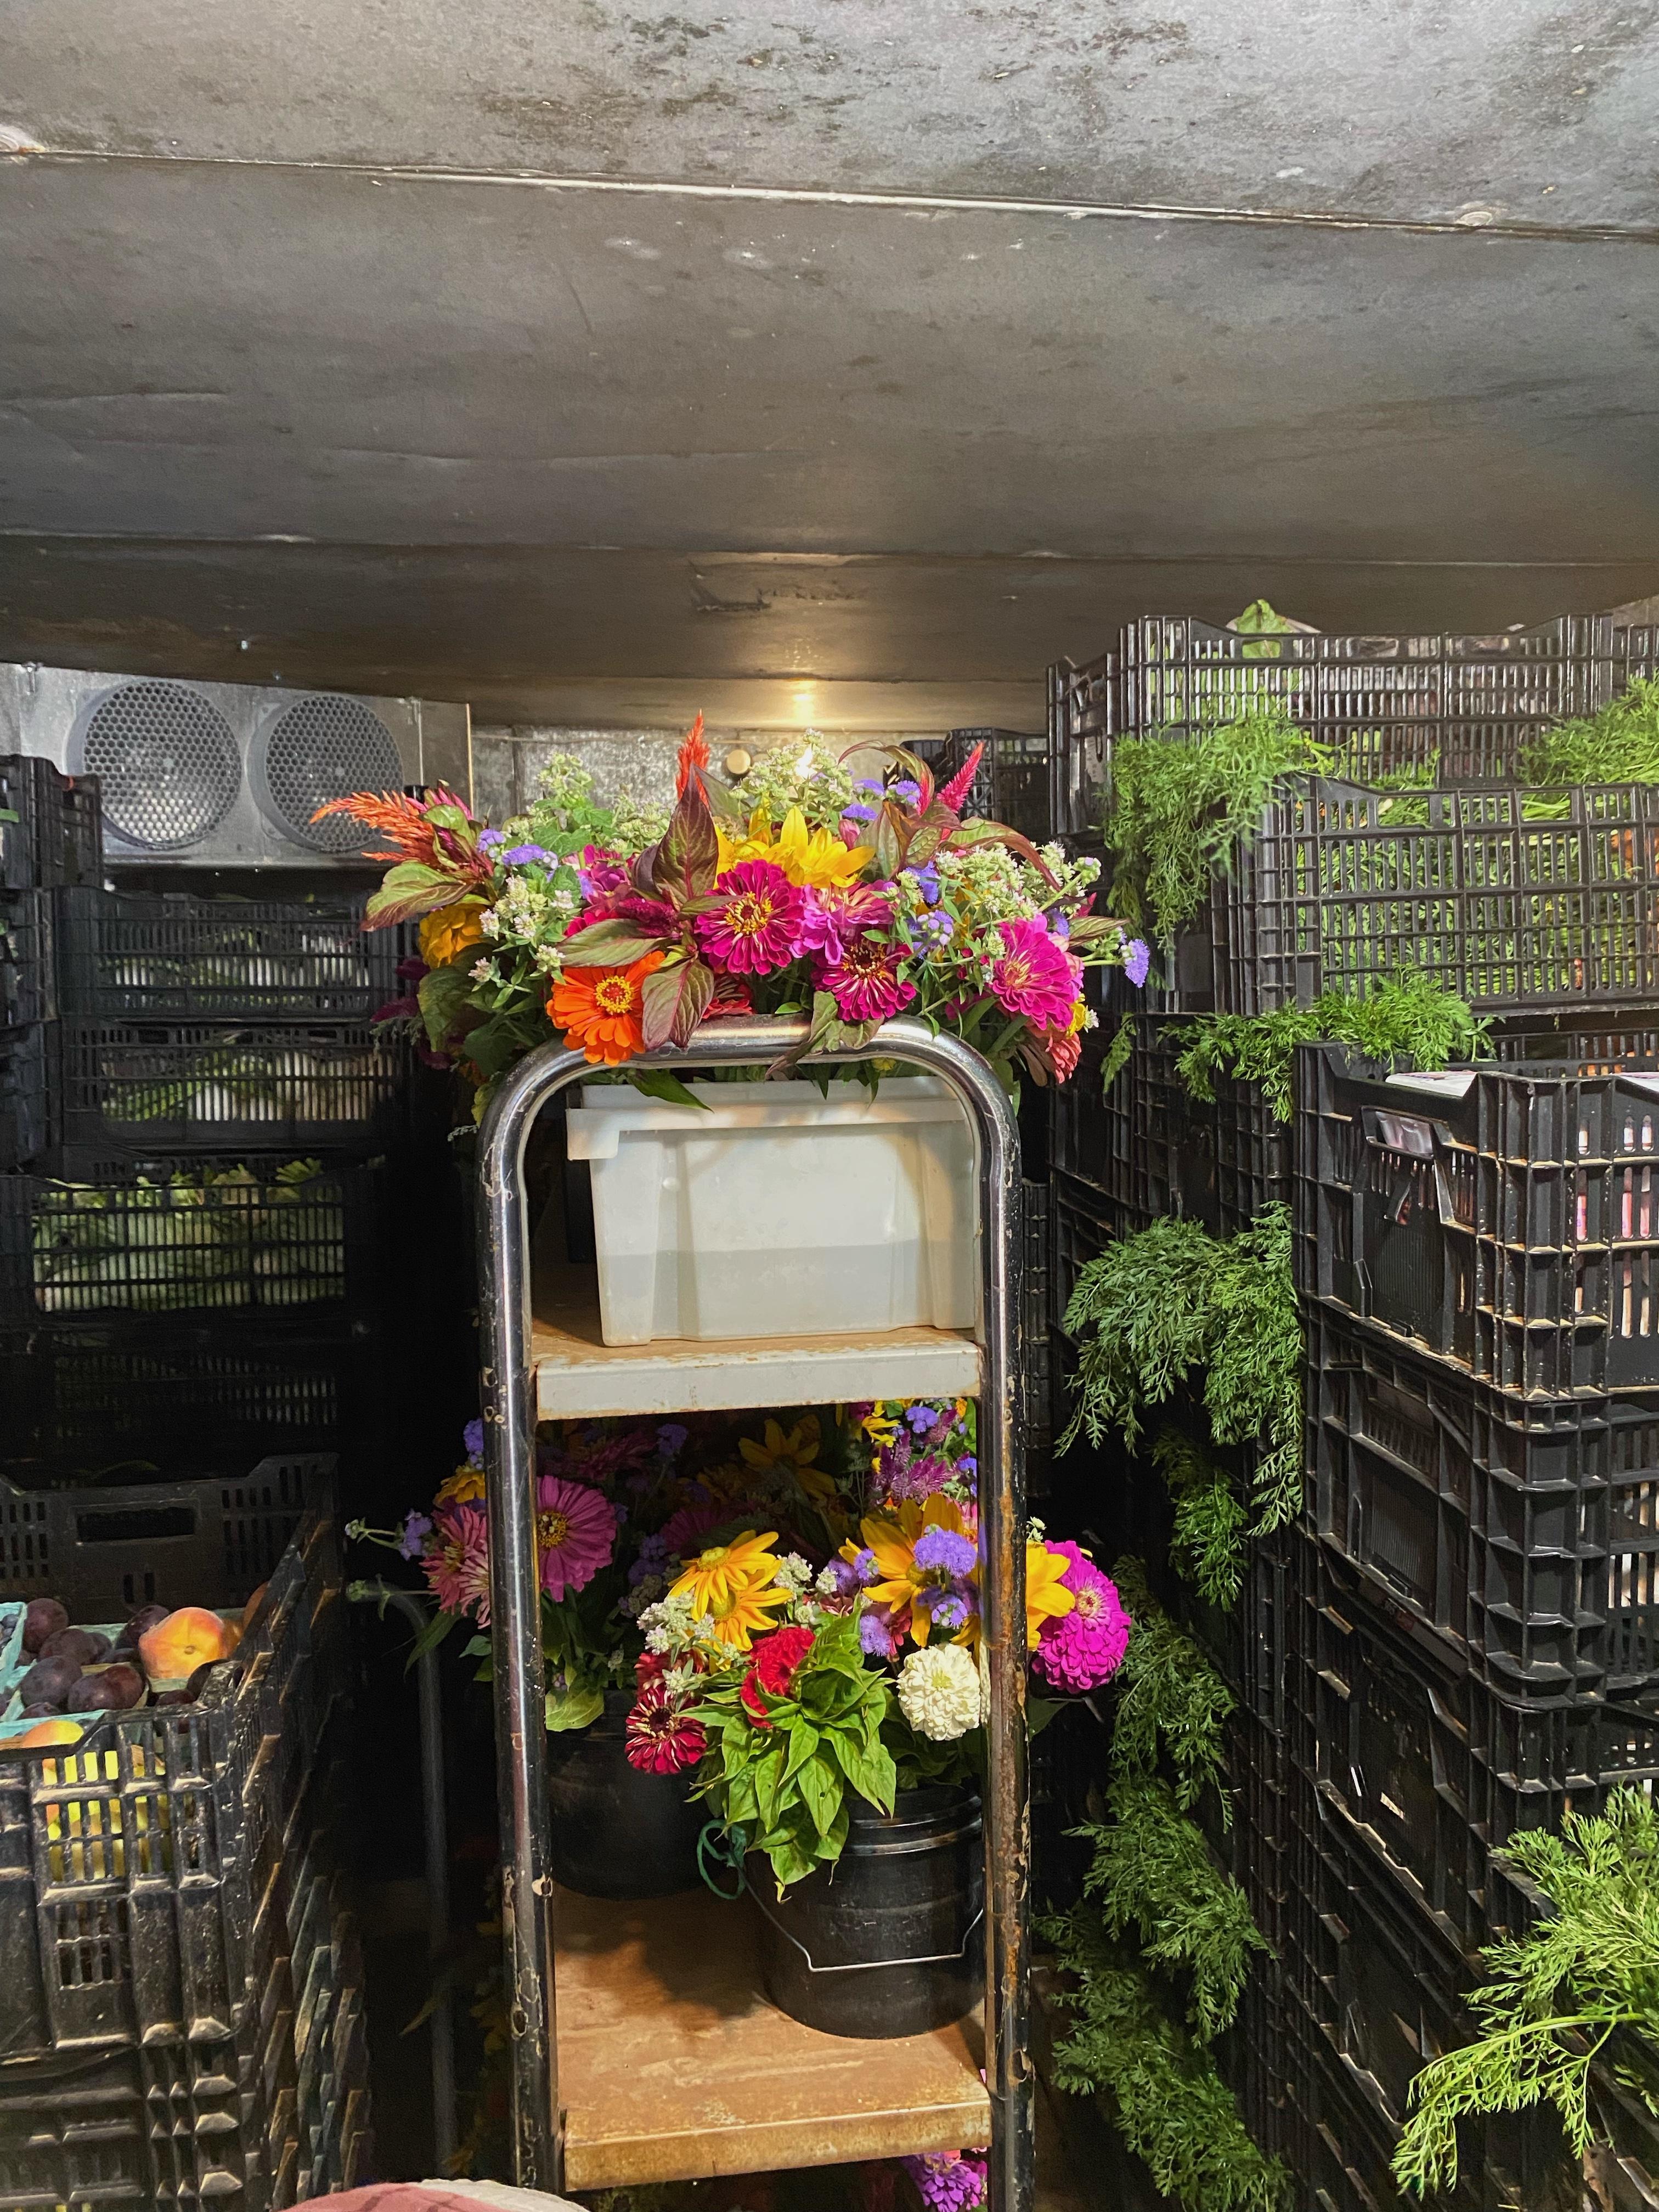 Autumn Week 4: Storing Vegetables